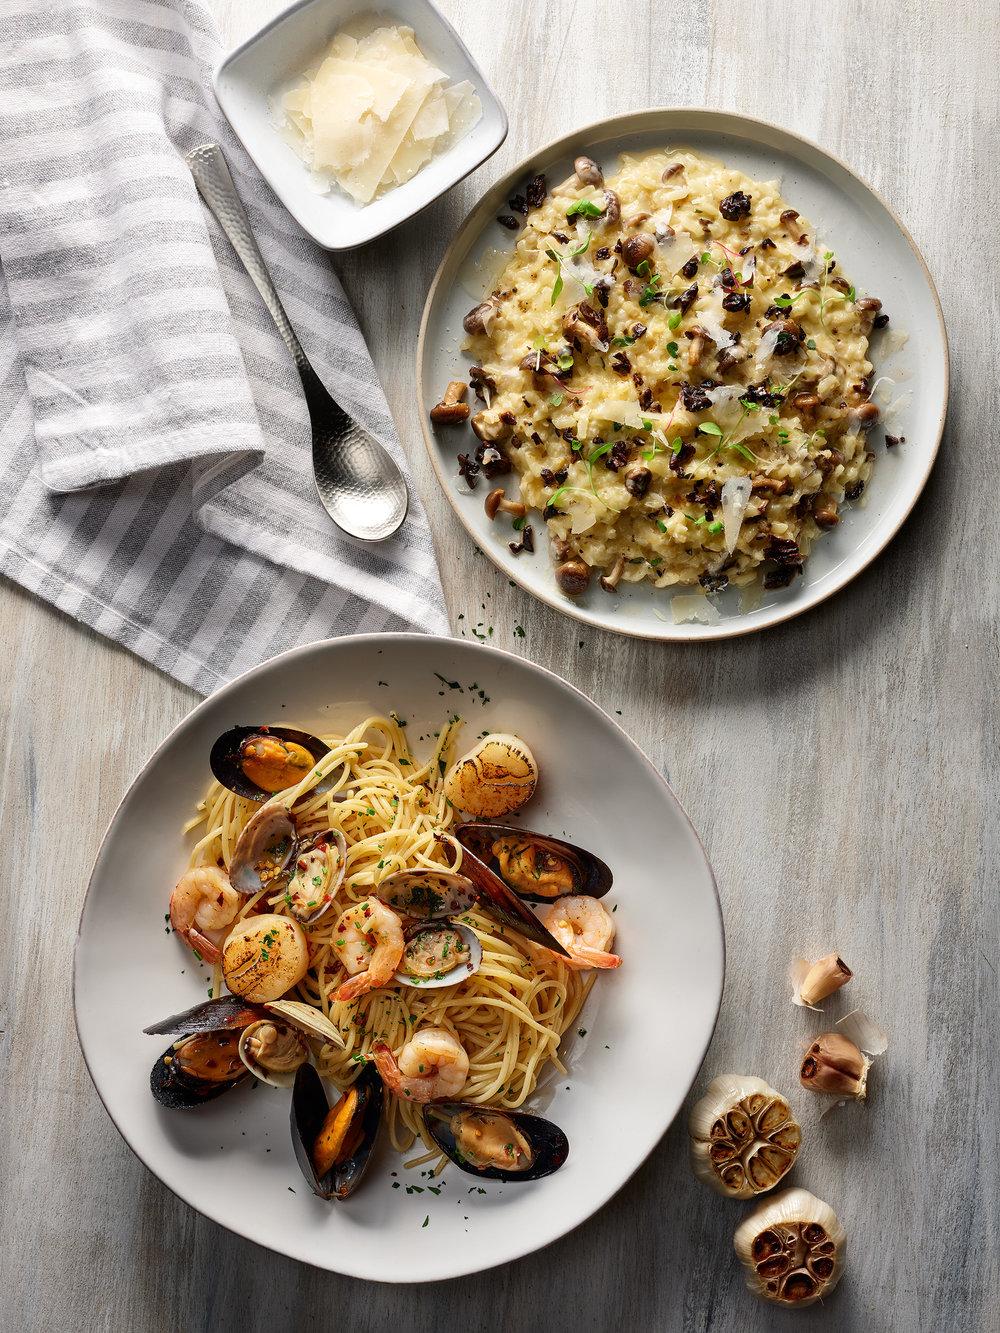 [NEW] Wild Mushroom and Truffle Risotto, Seafood Spaghetti Aglio E Olio_1.jpg